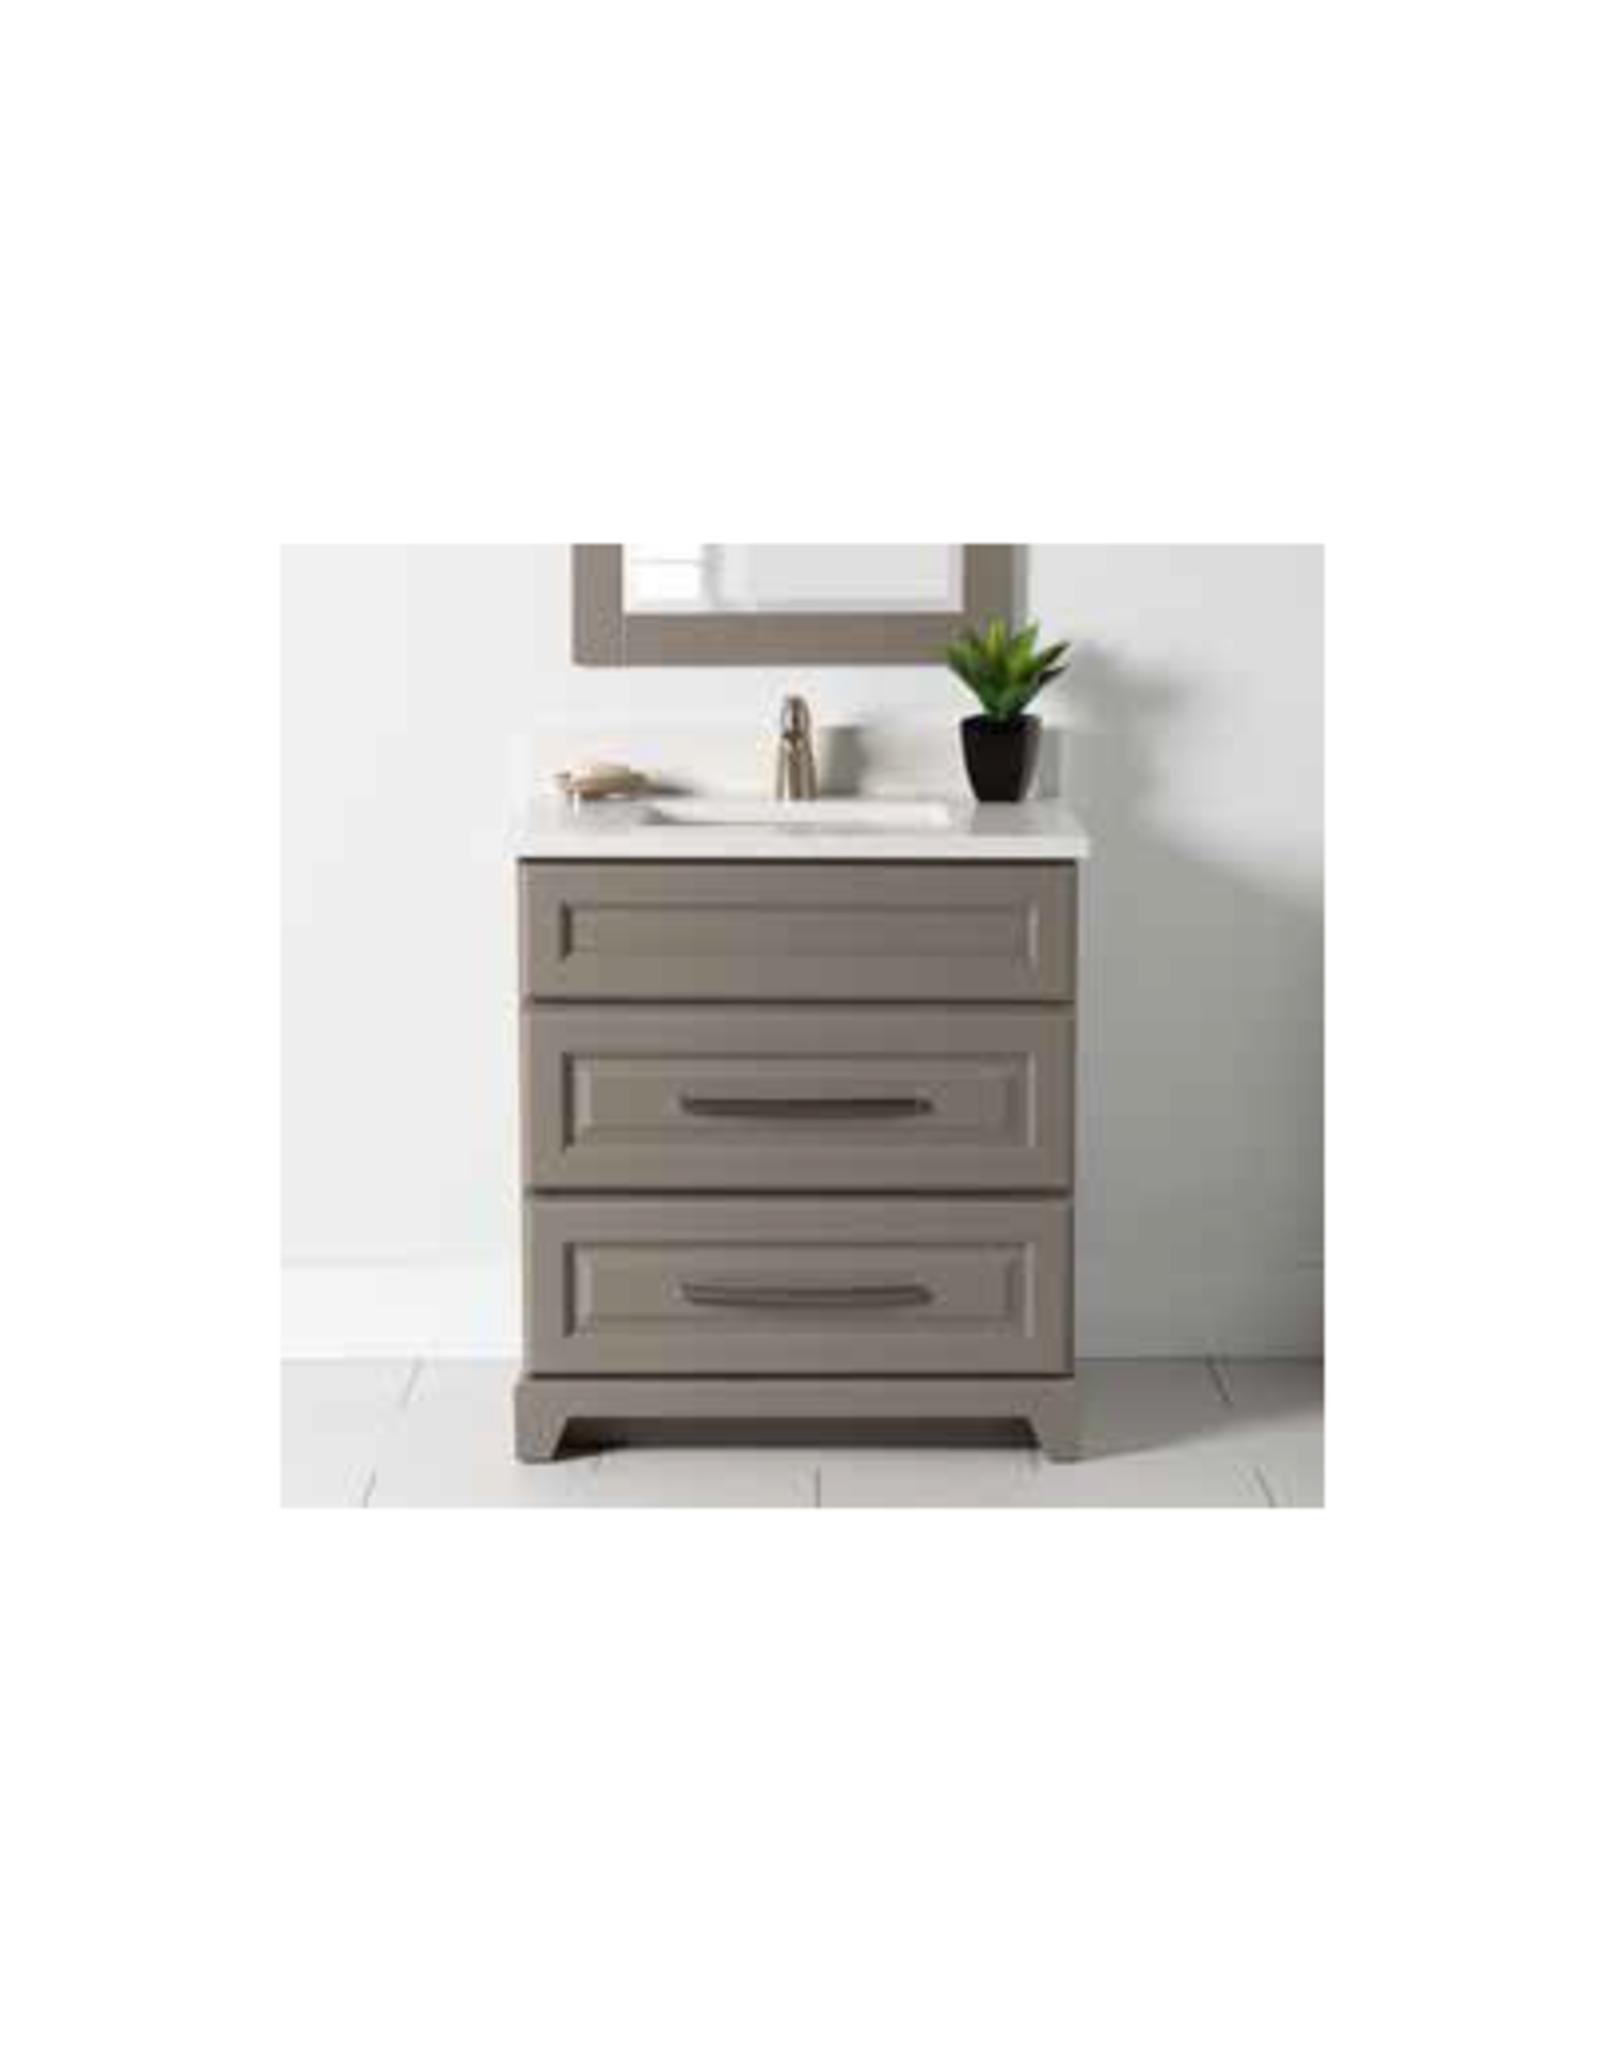 "Stonewood Premium 30"" Dresser Style Vanity, Top and Sink"